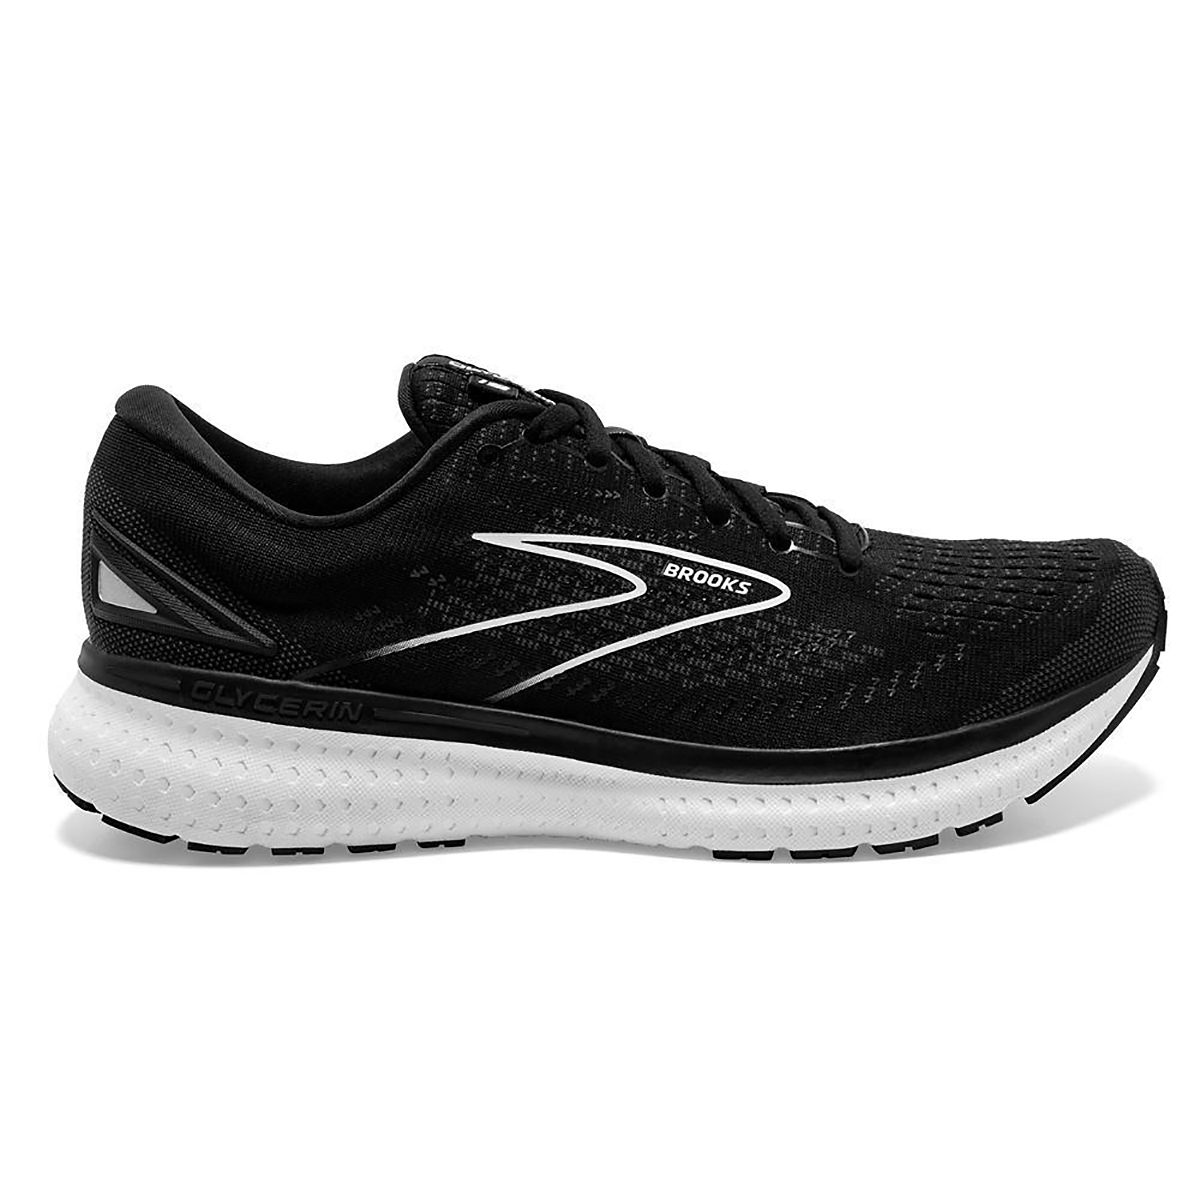 Men's Brooks Glycerin 19 Running Shoe - Color: Black/White - Size: 7 - Width: Regular, Black/White, large, image 1